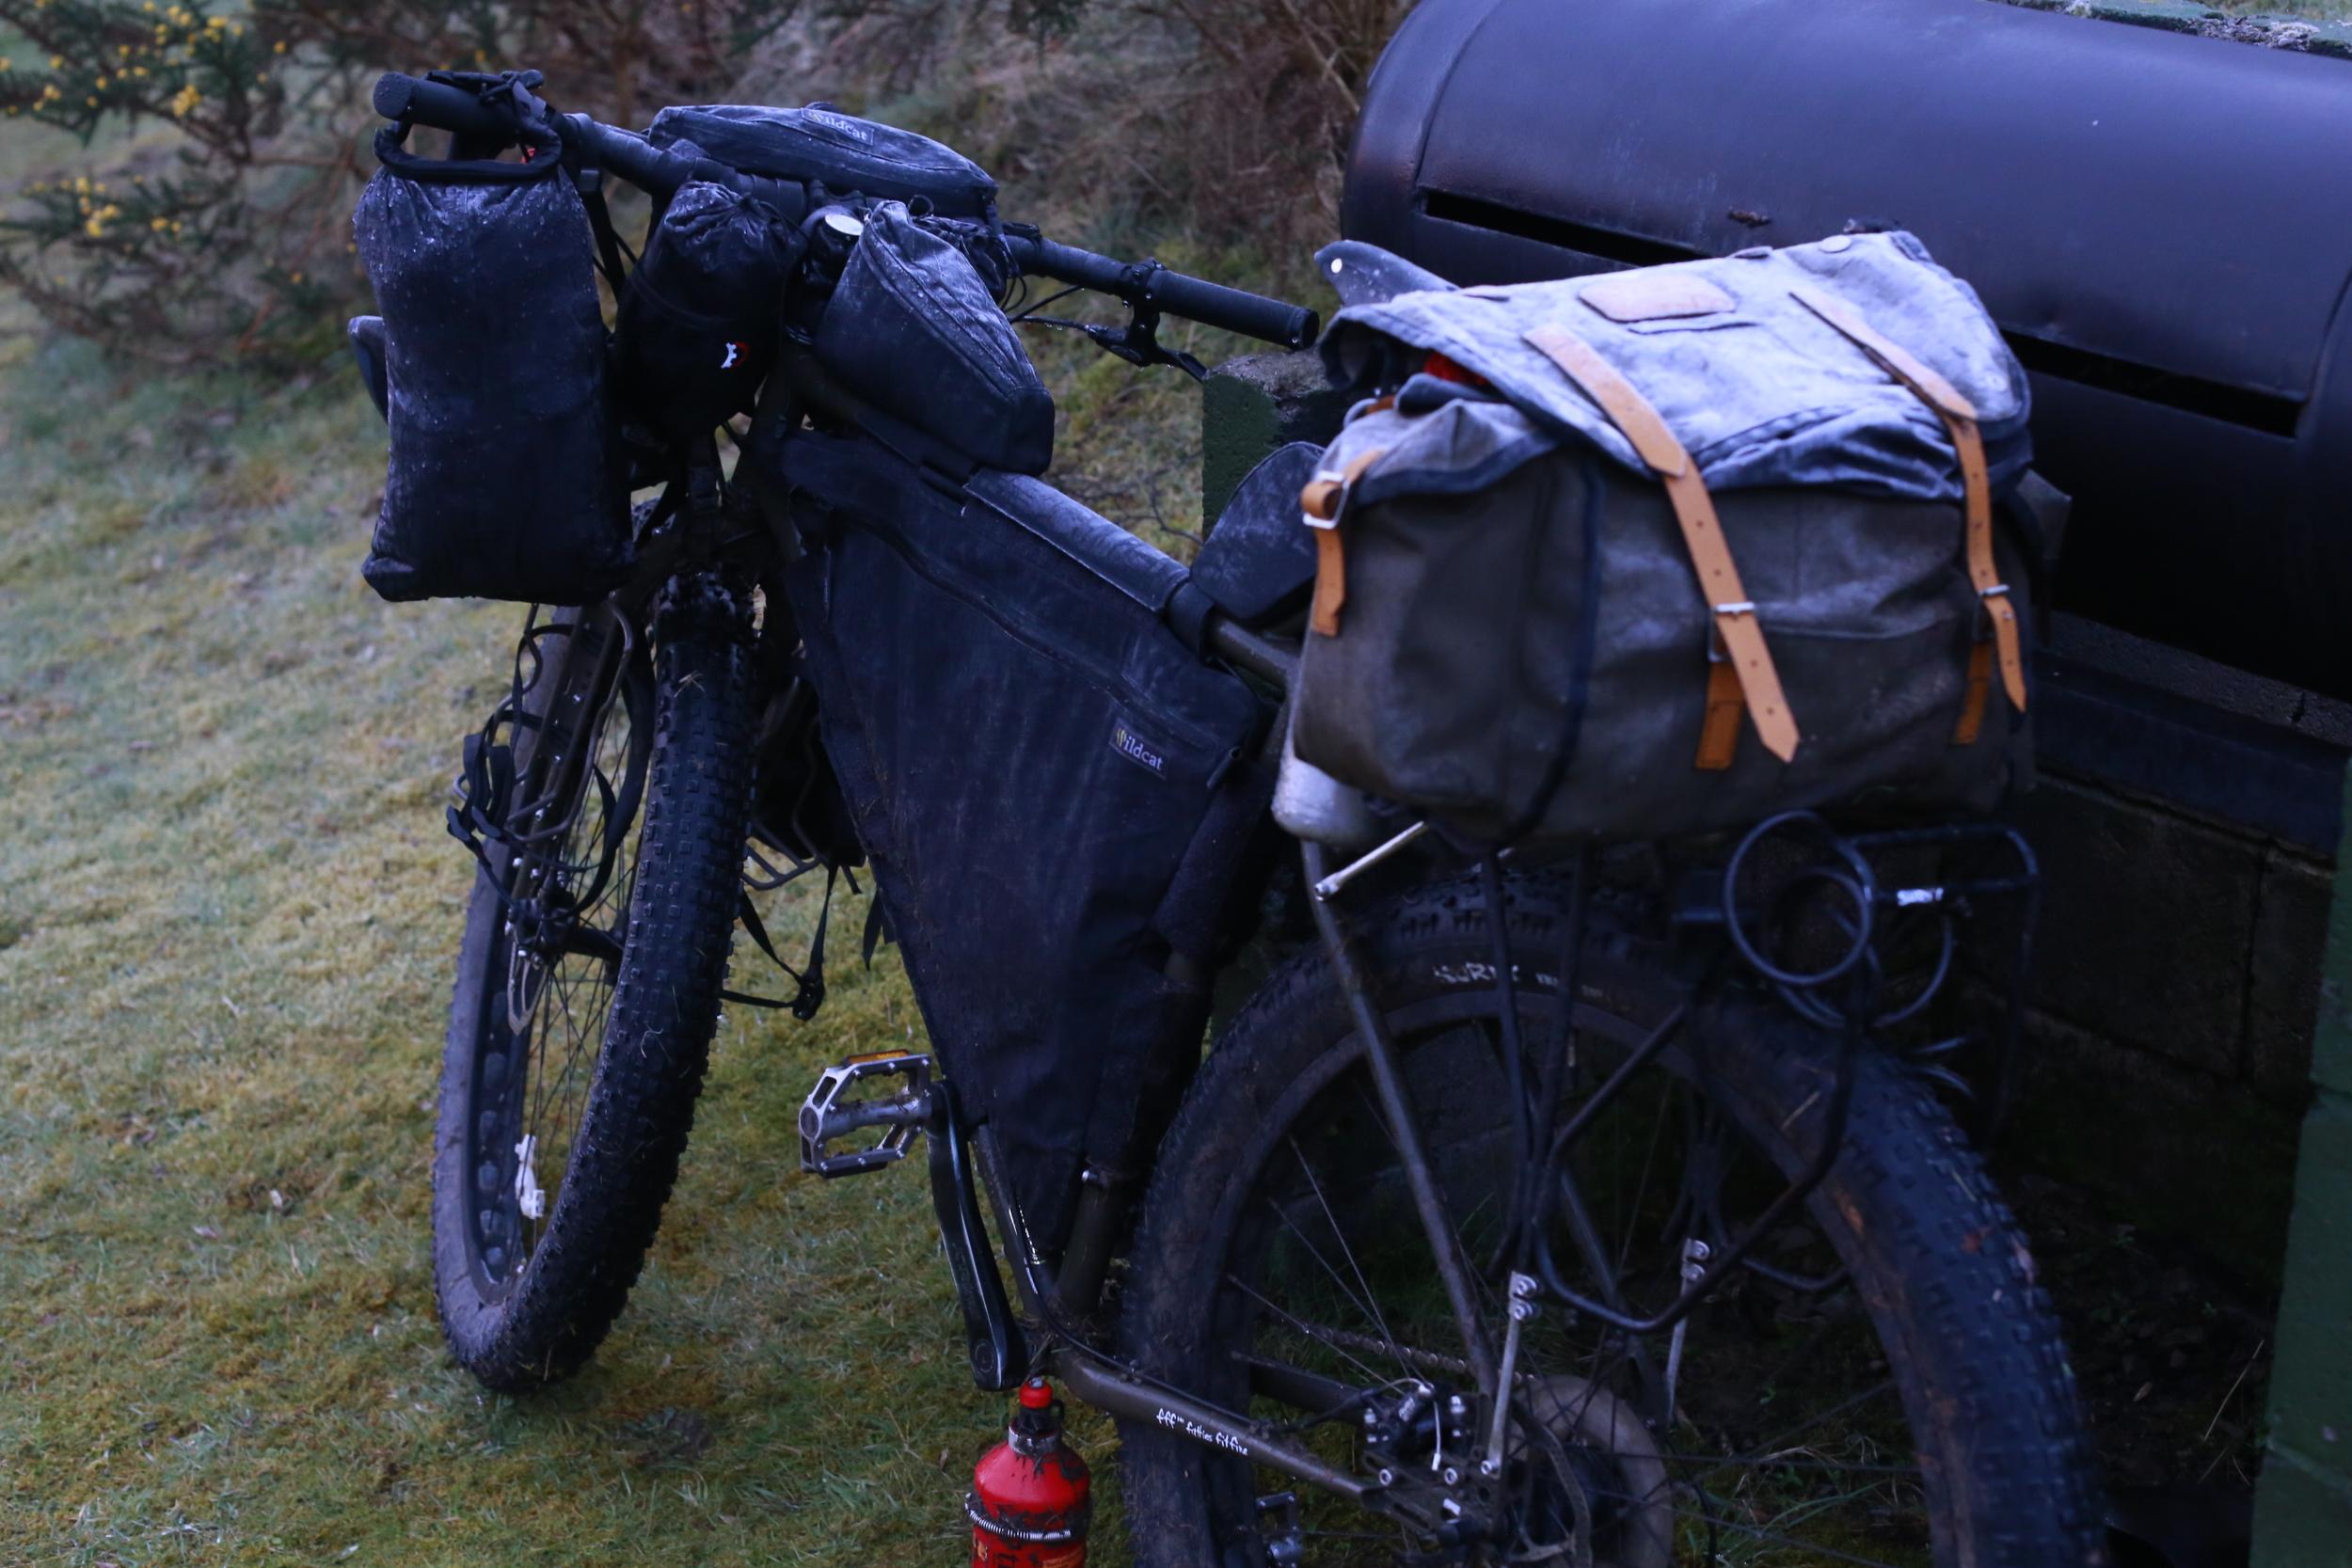 surly, surly ecr, bikepacking, bikepacking blog, bicycle touring, cycle touring, bicycle touring apocalypse, wildcat, wildcat gear, carradice longflap camper, snugpak, knards, surly, surly bikes, surly ecr, bicycle touring apocalypse, steel frame, 29er, trangia, surly rack, surly rear rack